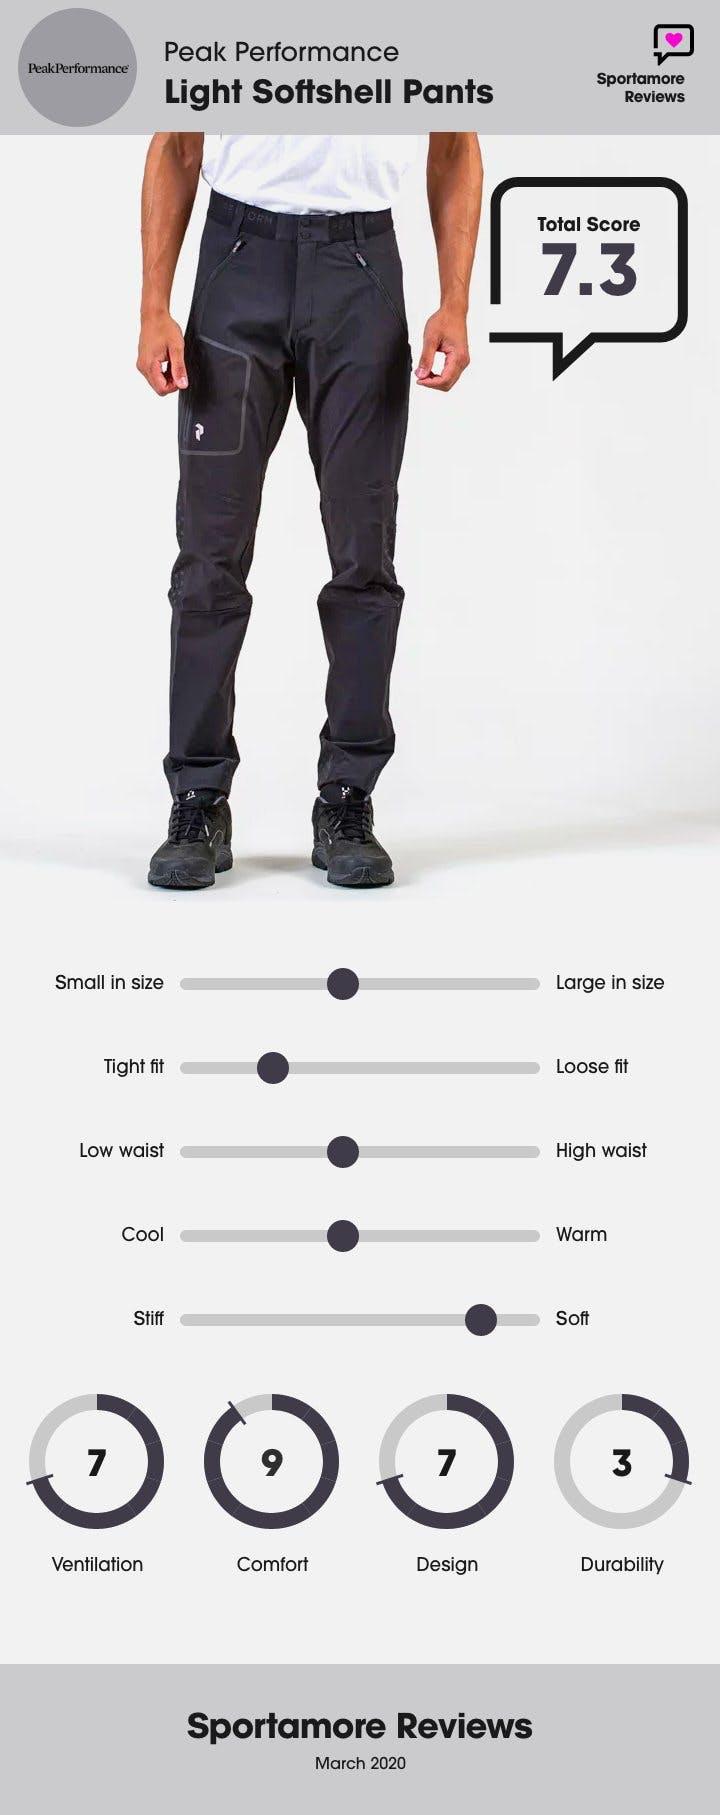 Herr - Peak Performance Light Softshell Pants.jpg